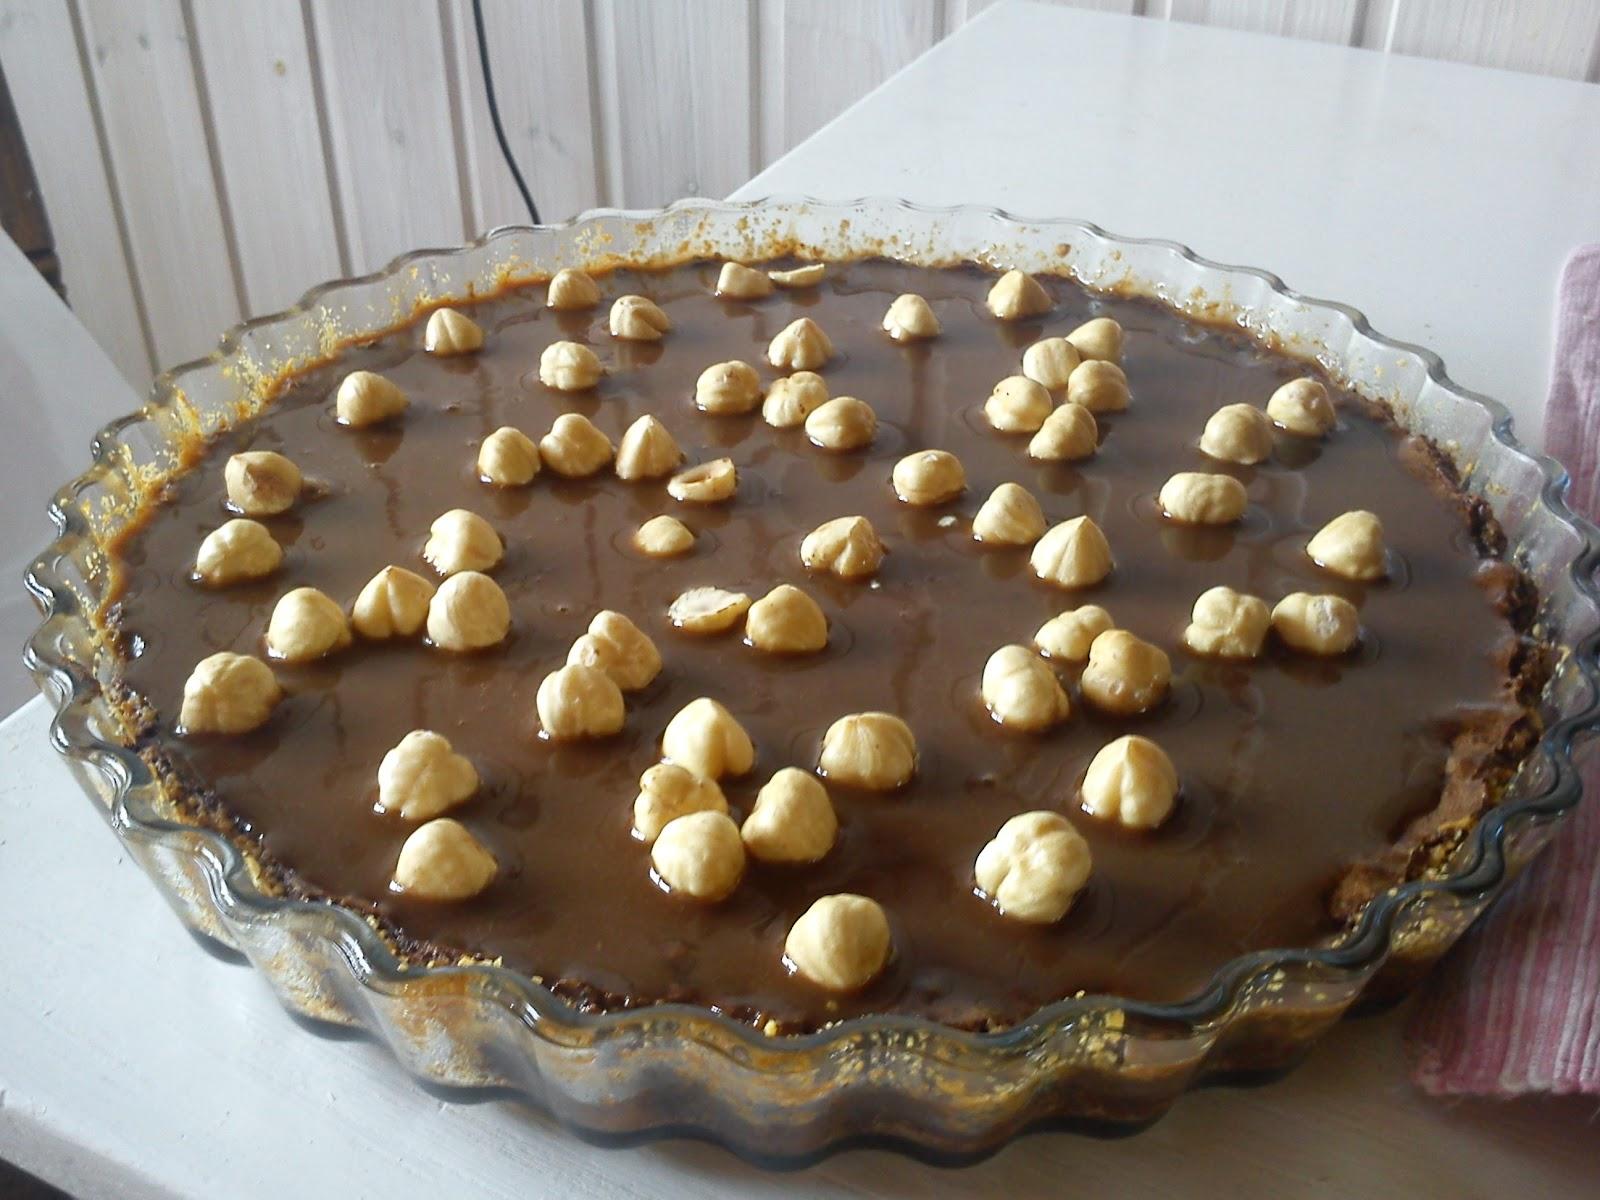 kan man smälta choklad i kastrull